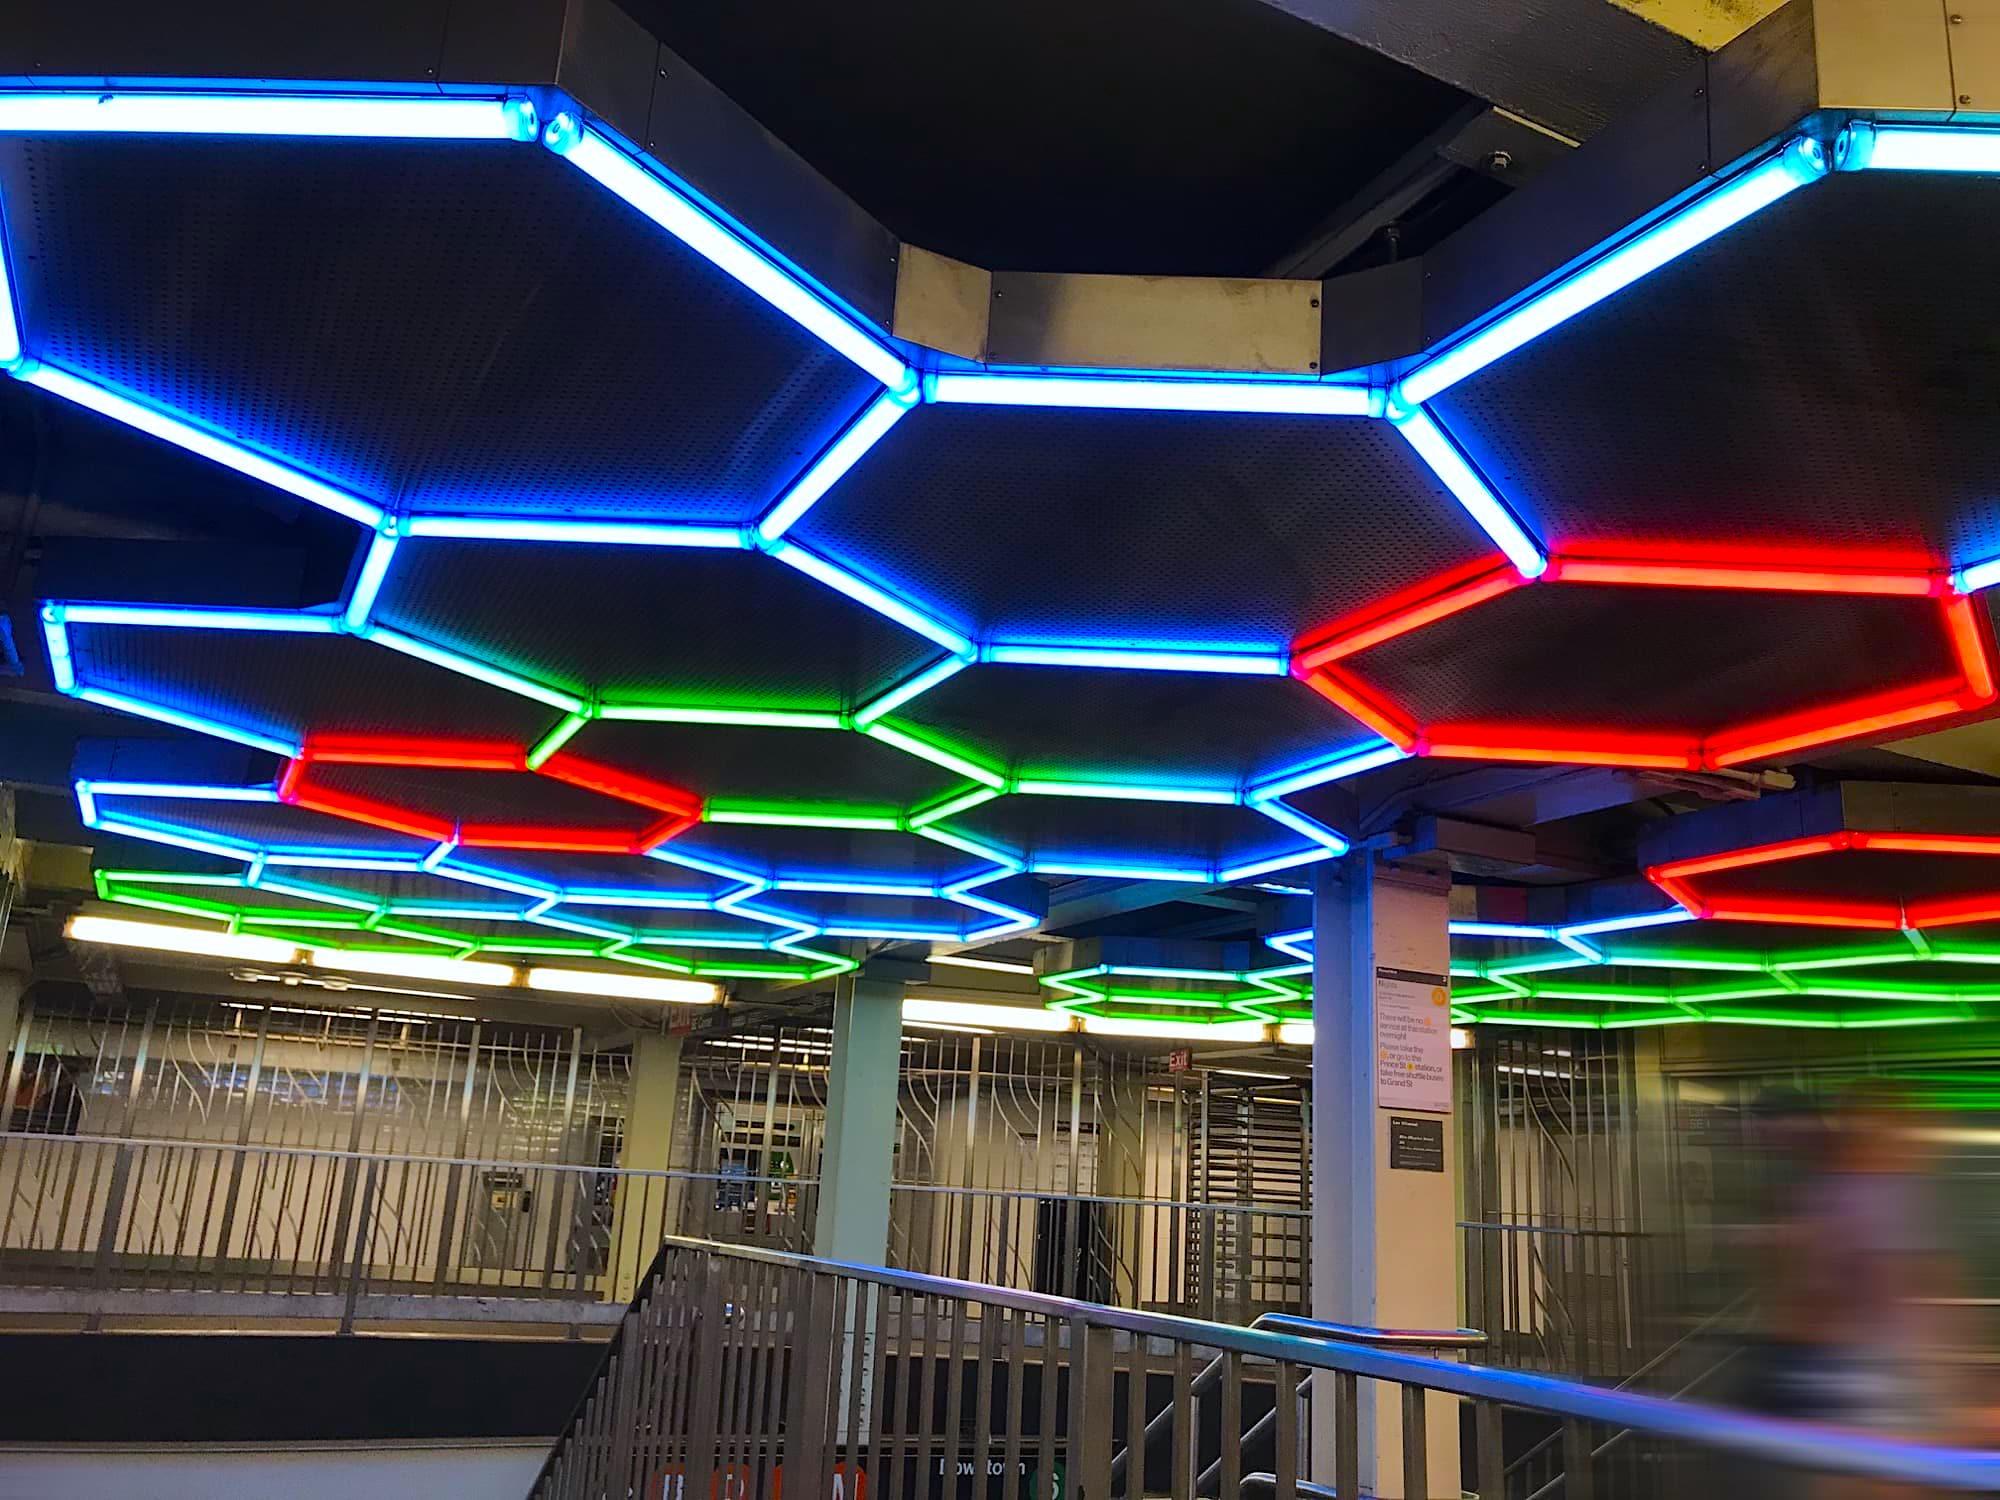 Photo of hexagonal light show installation at Bleecker Street Subway Station